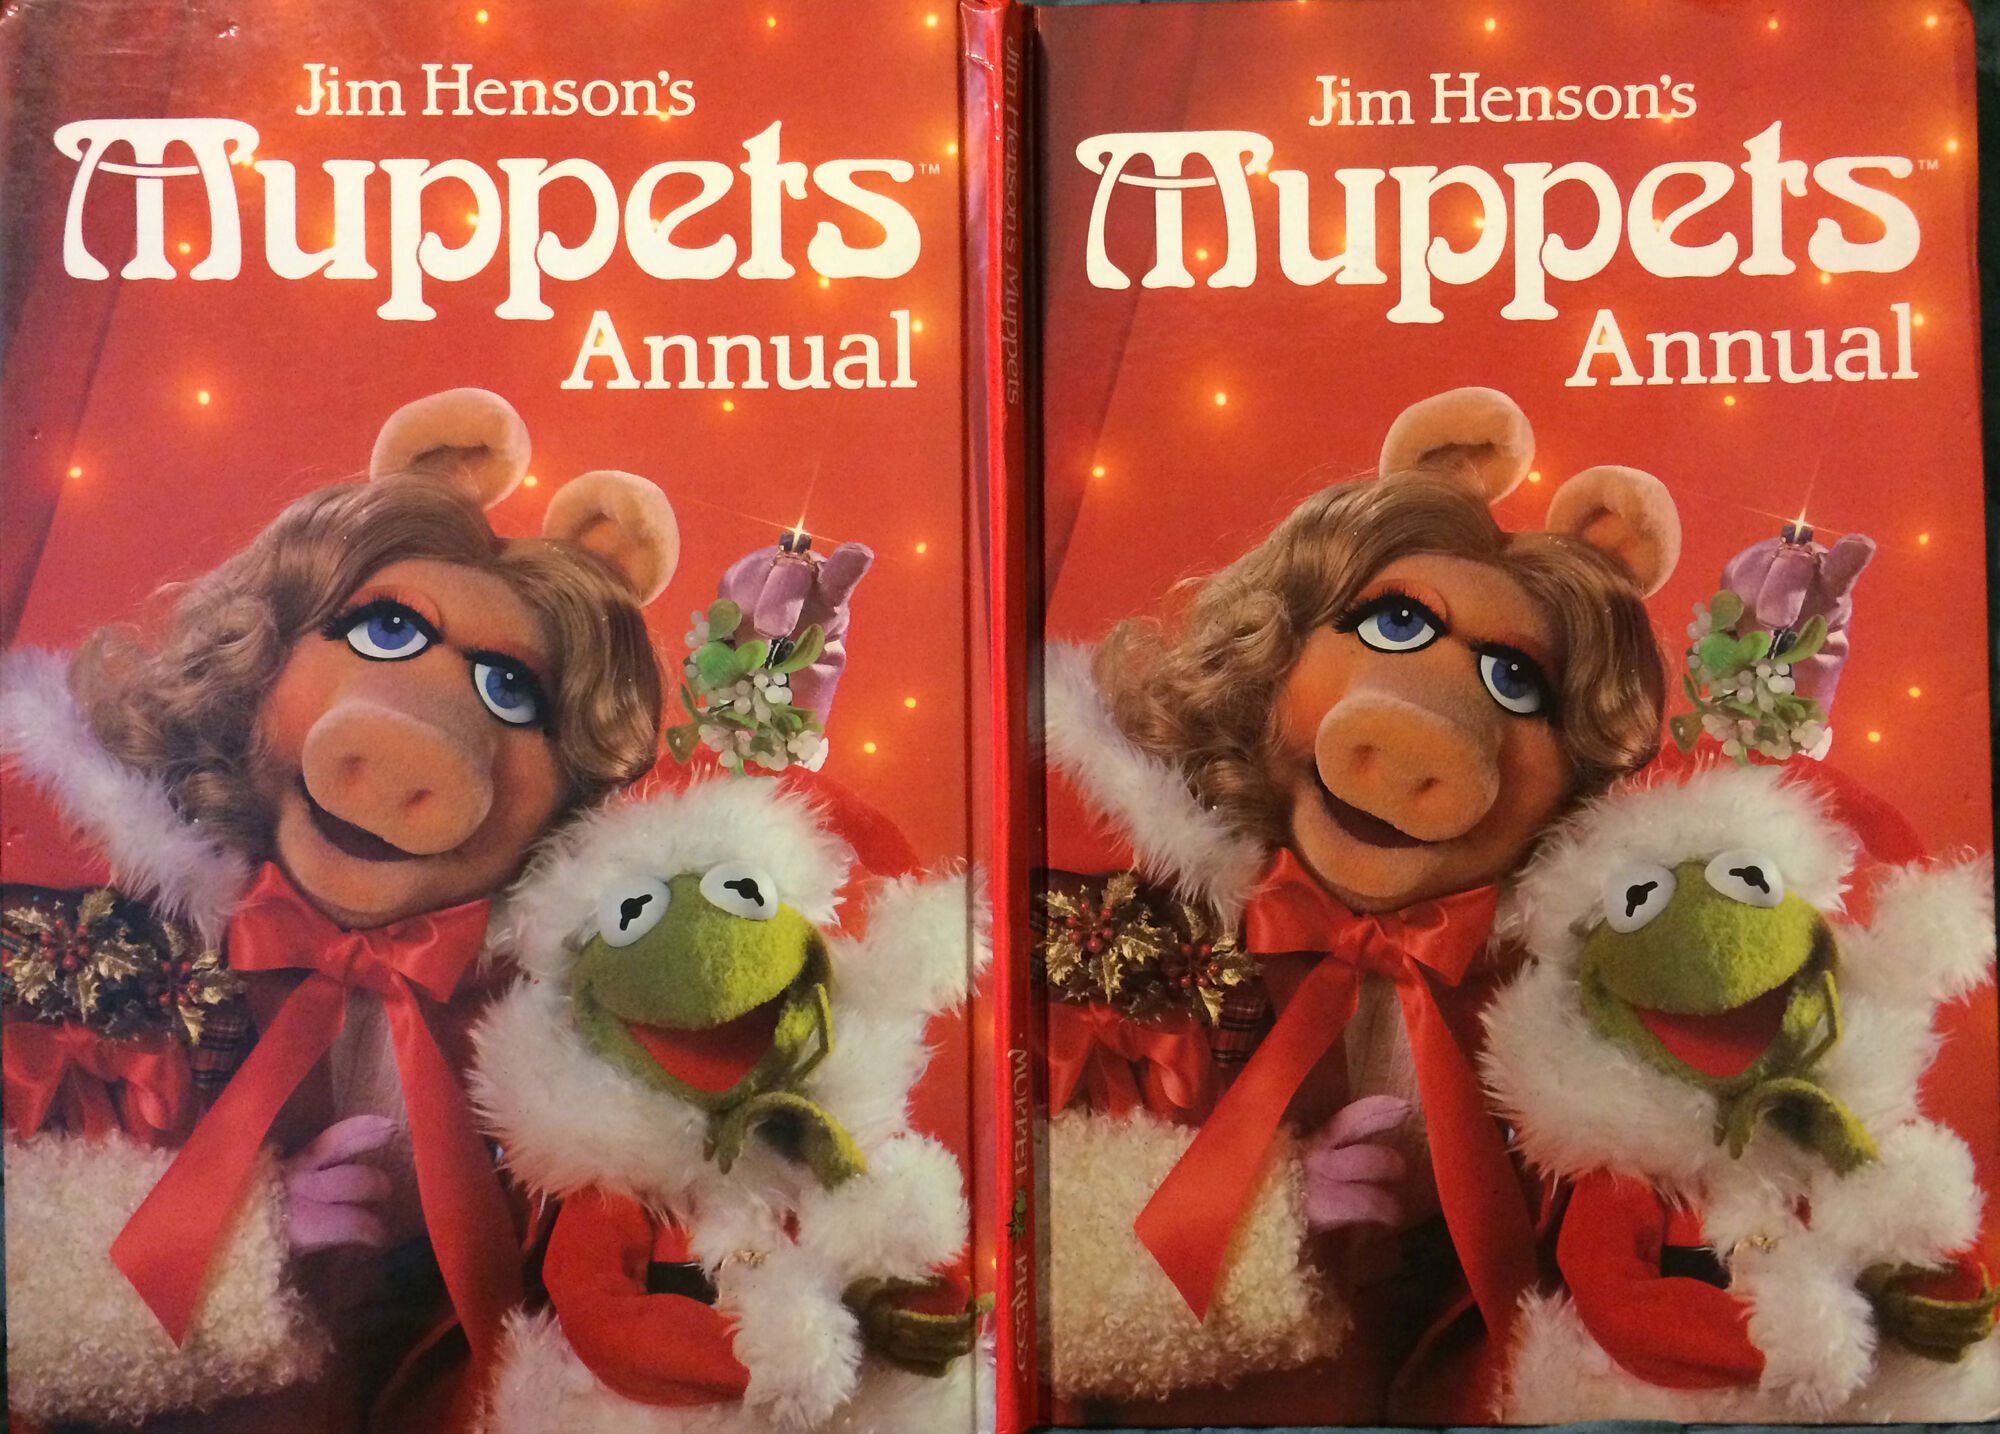 Jim Henson\'s Muppets Annual 1983 | Muppet Wiki | FANDOM powered by Wikia